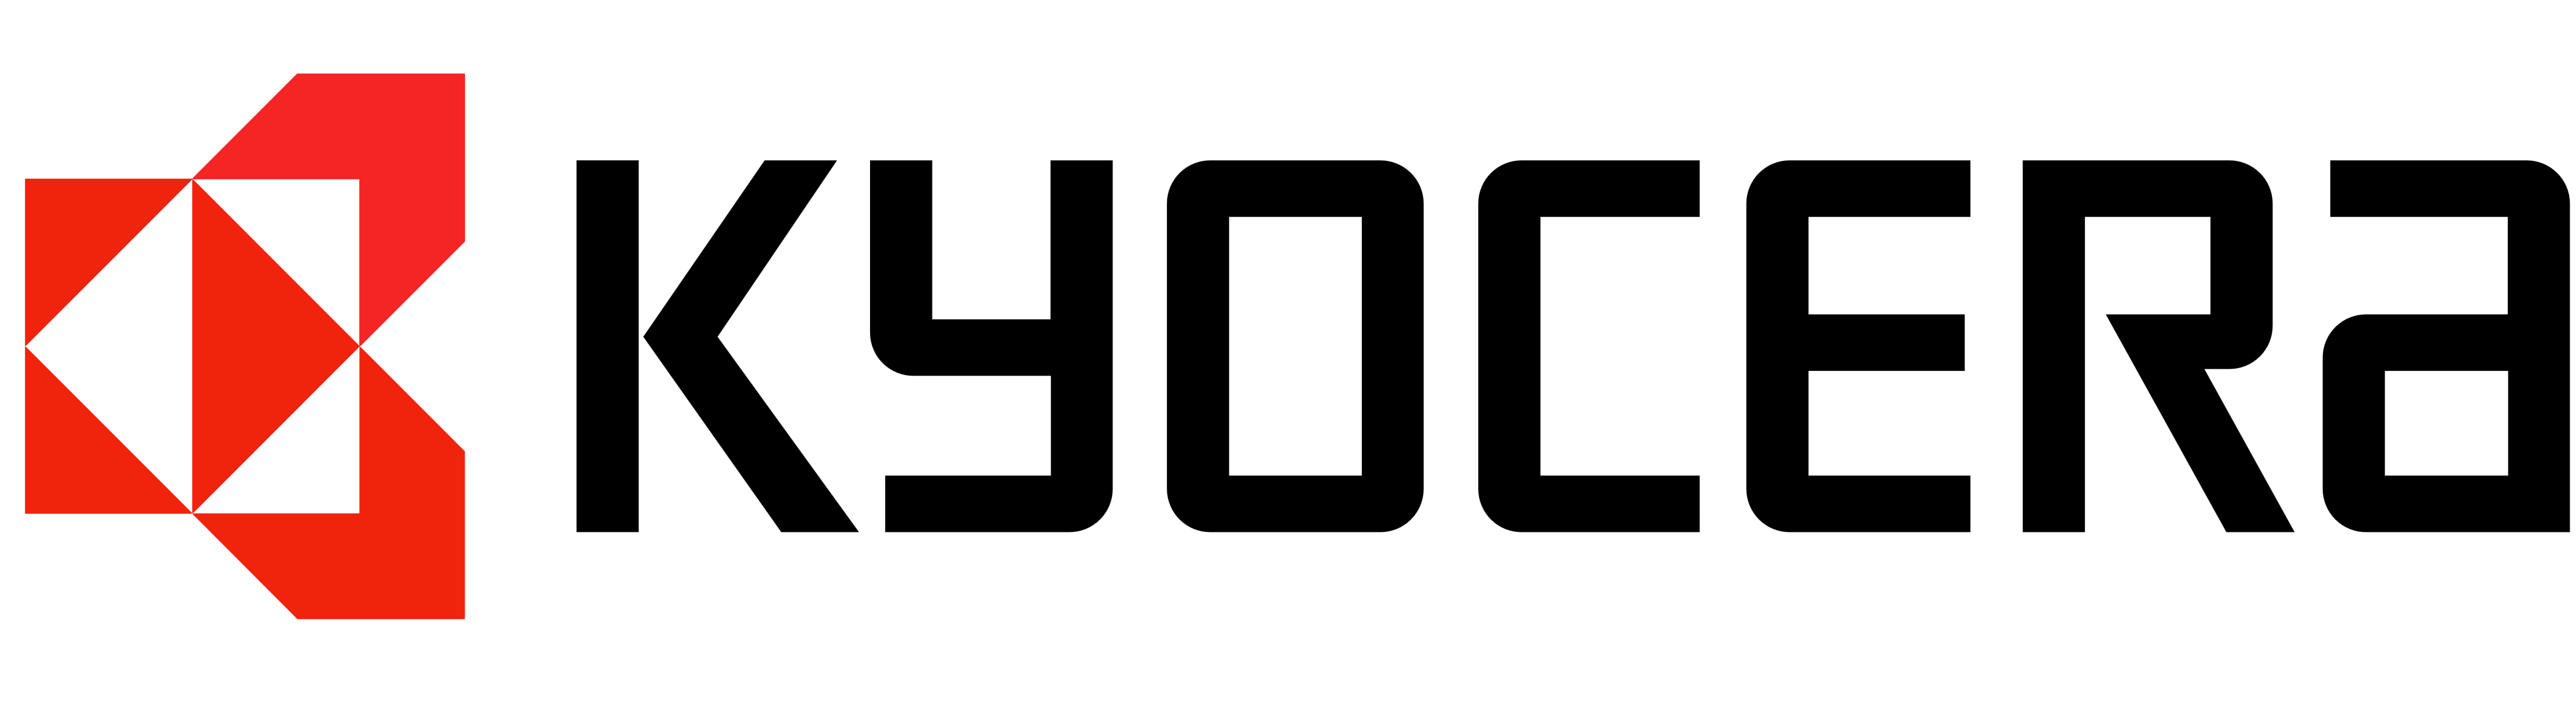 img-7